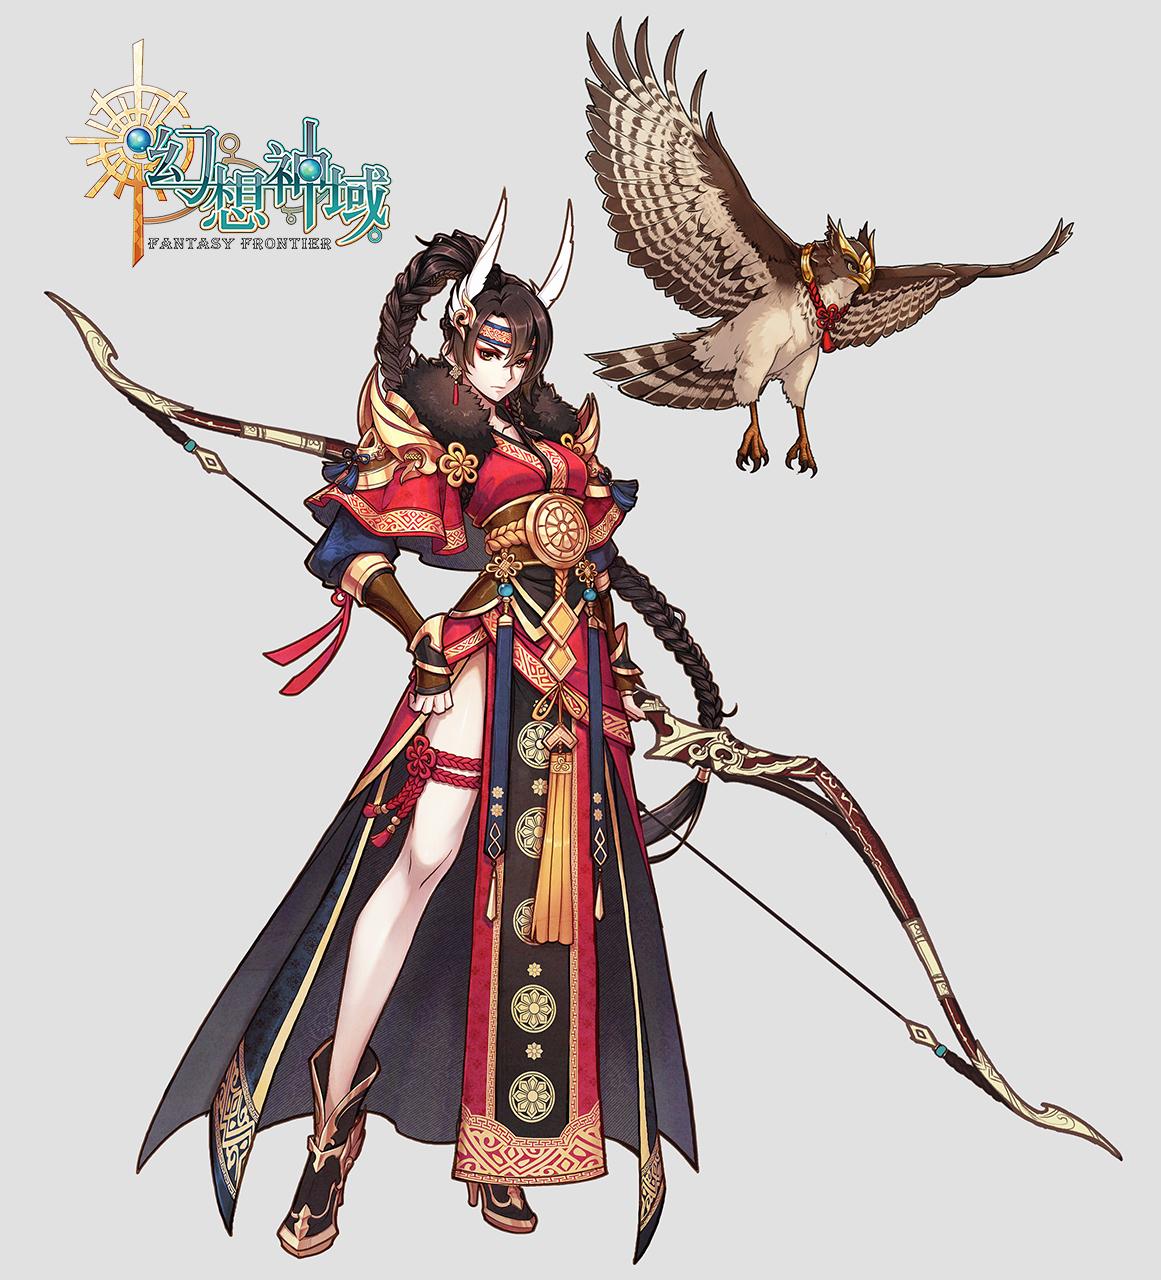 Character Design For Games Pdf : Yumikaze gallery aura kingdom wiki fandom powered by wikia